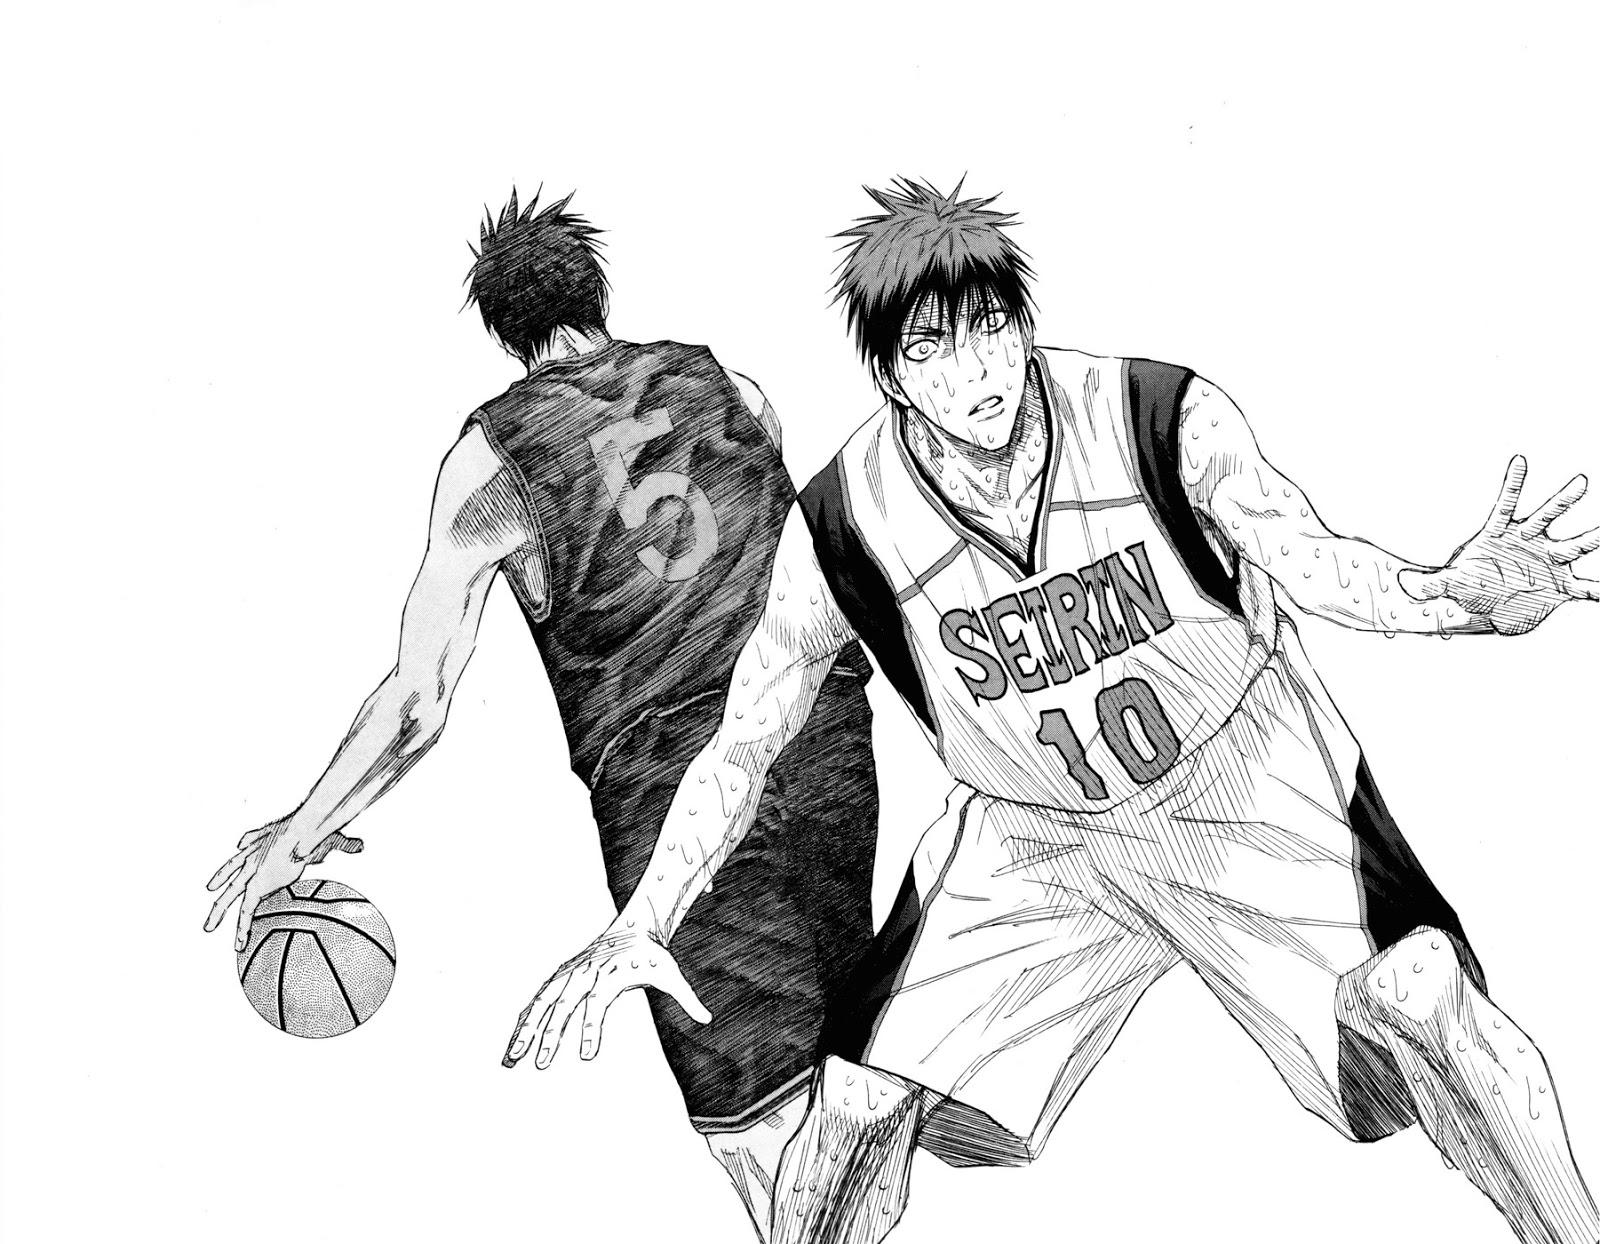 Kuroko no Basket Manga Chapter 133 - Image 11-11